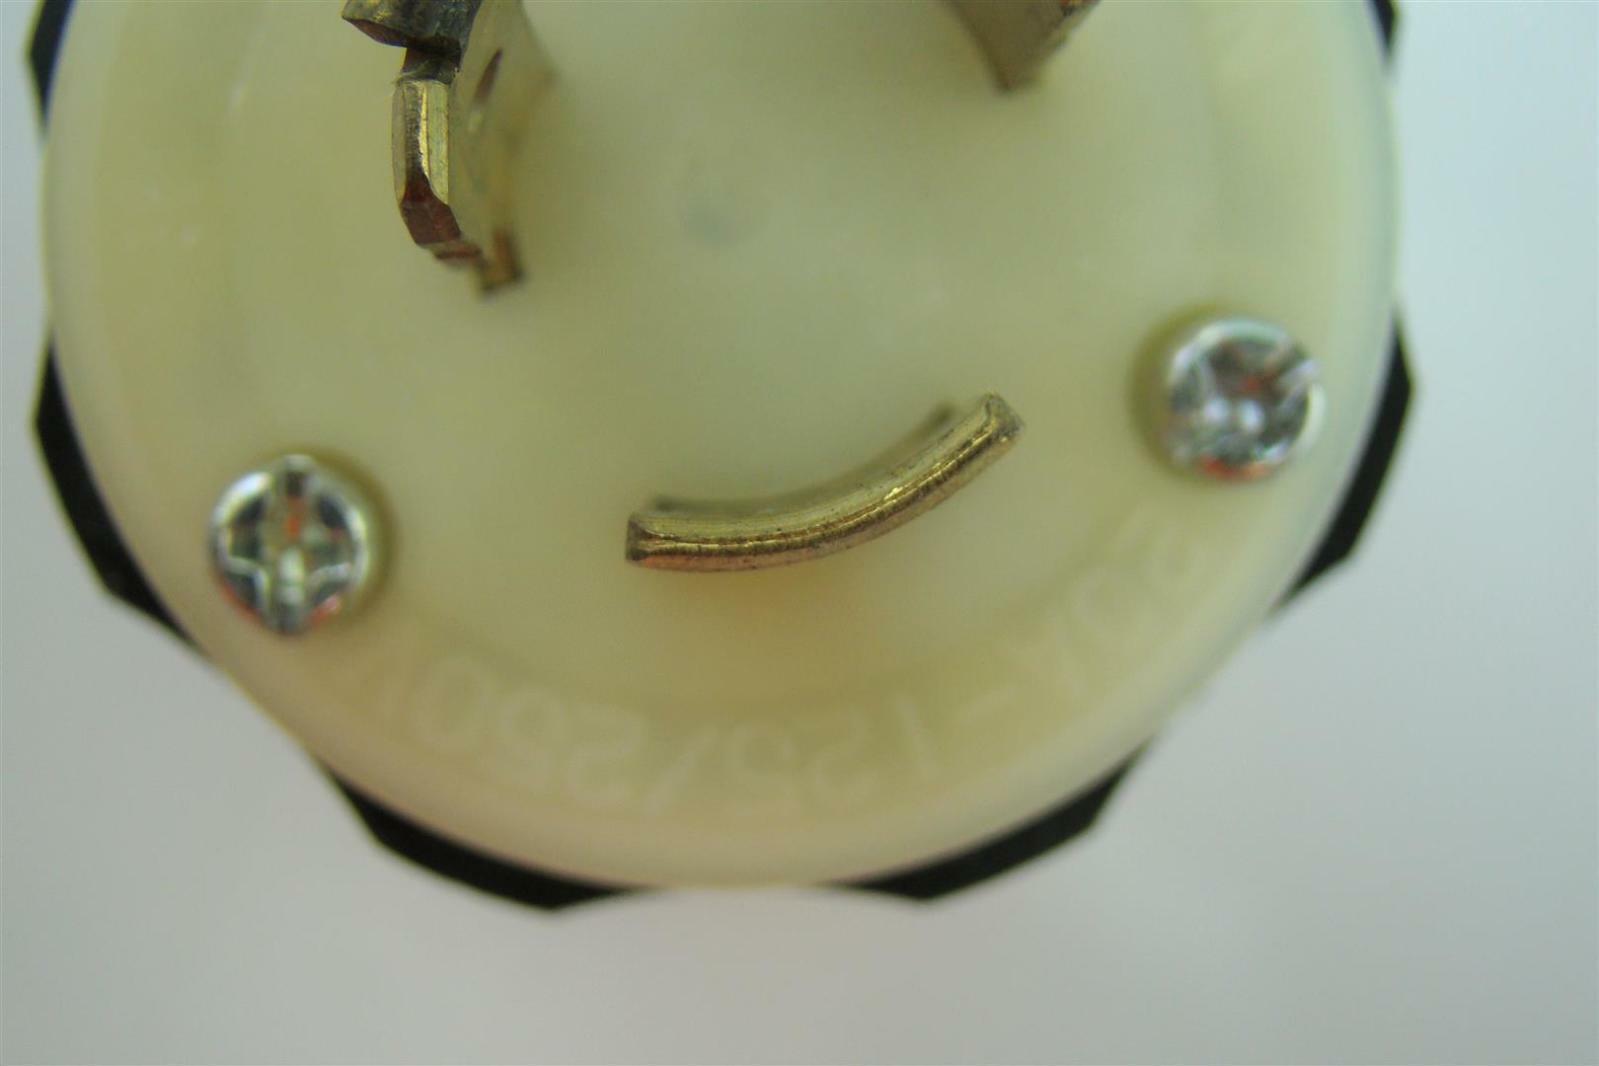 Leviton 9965-C 20Amp 125/250V Locking Plug 9965-C   eBay